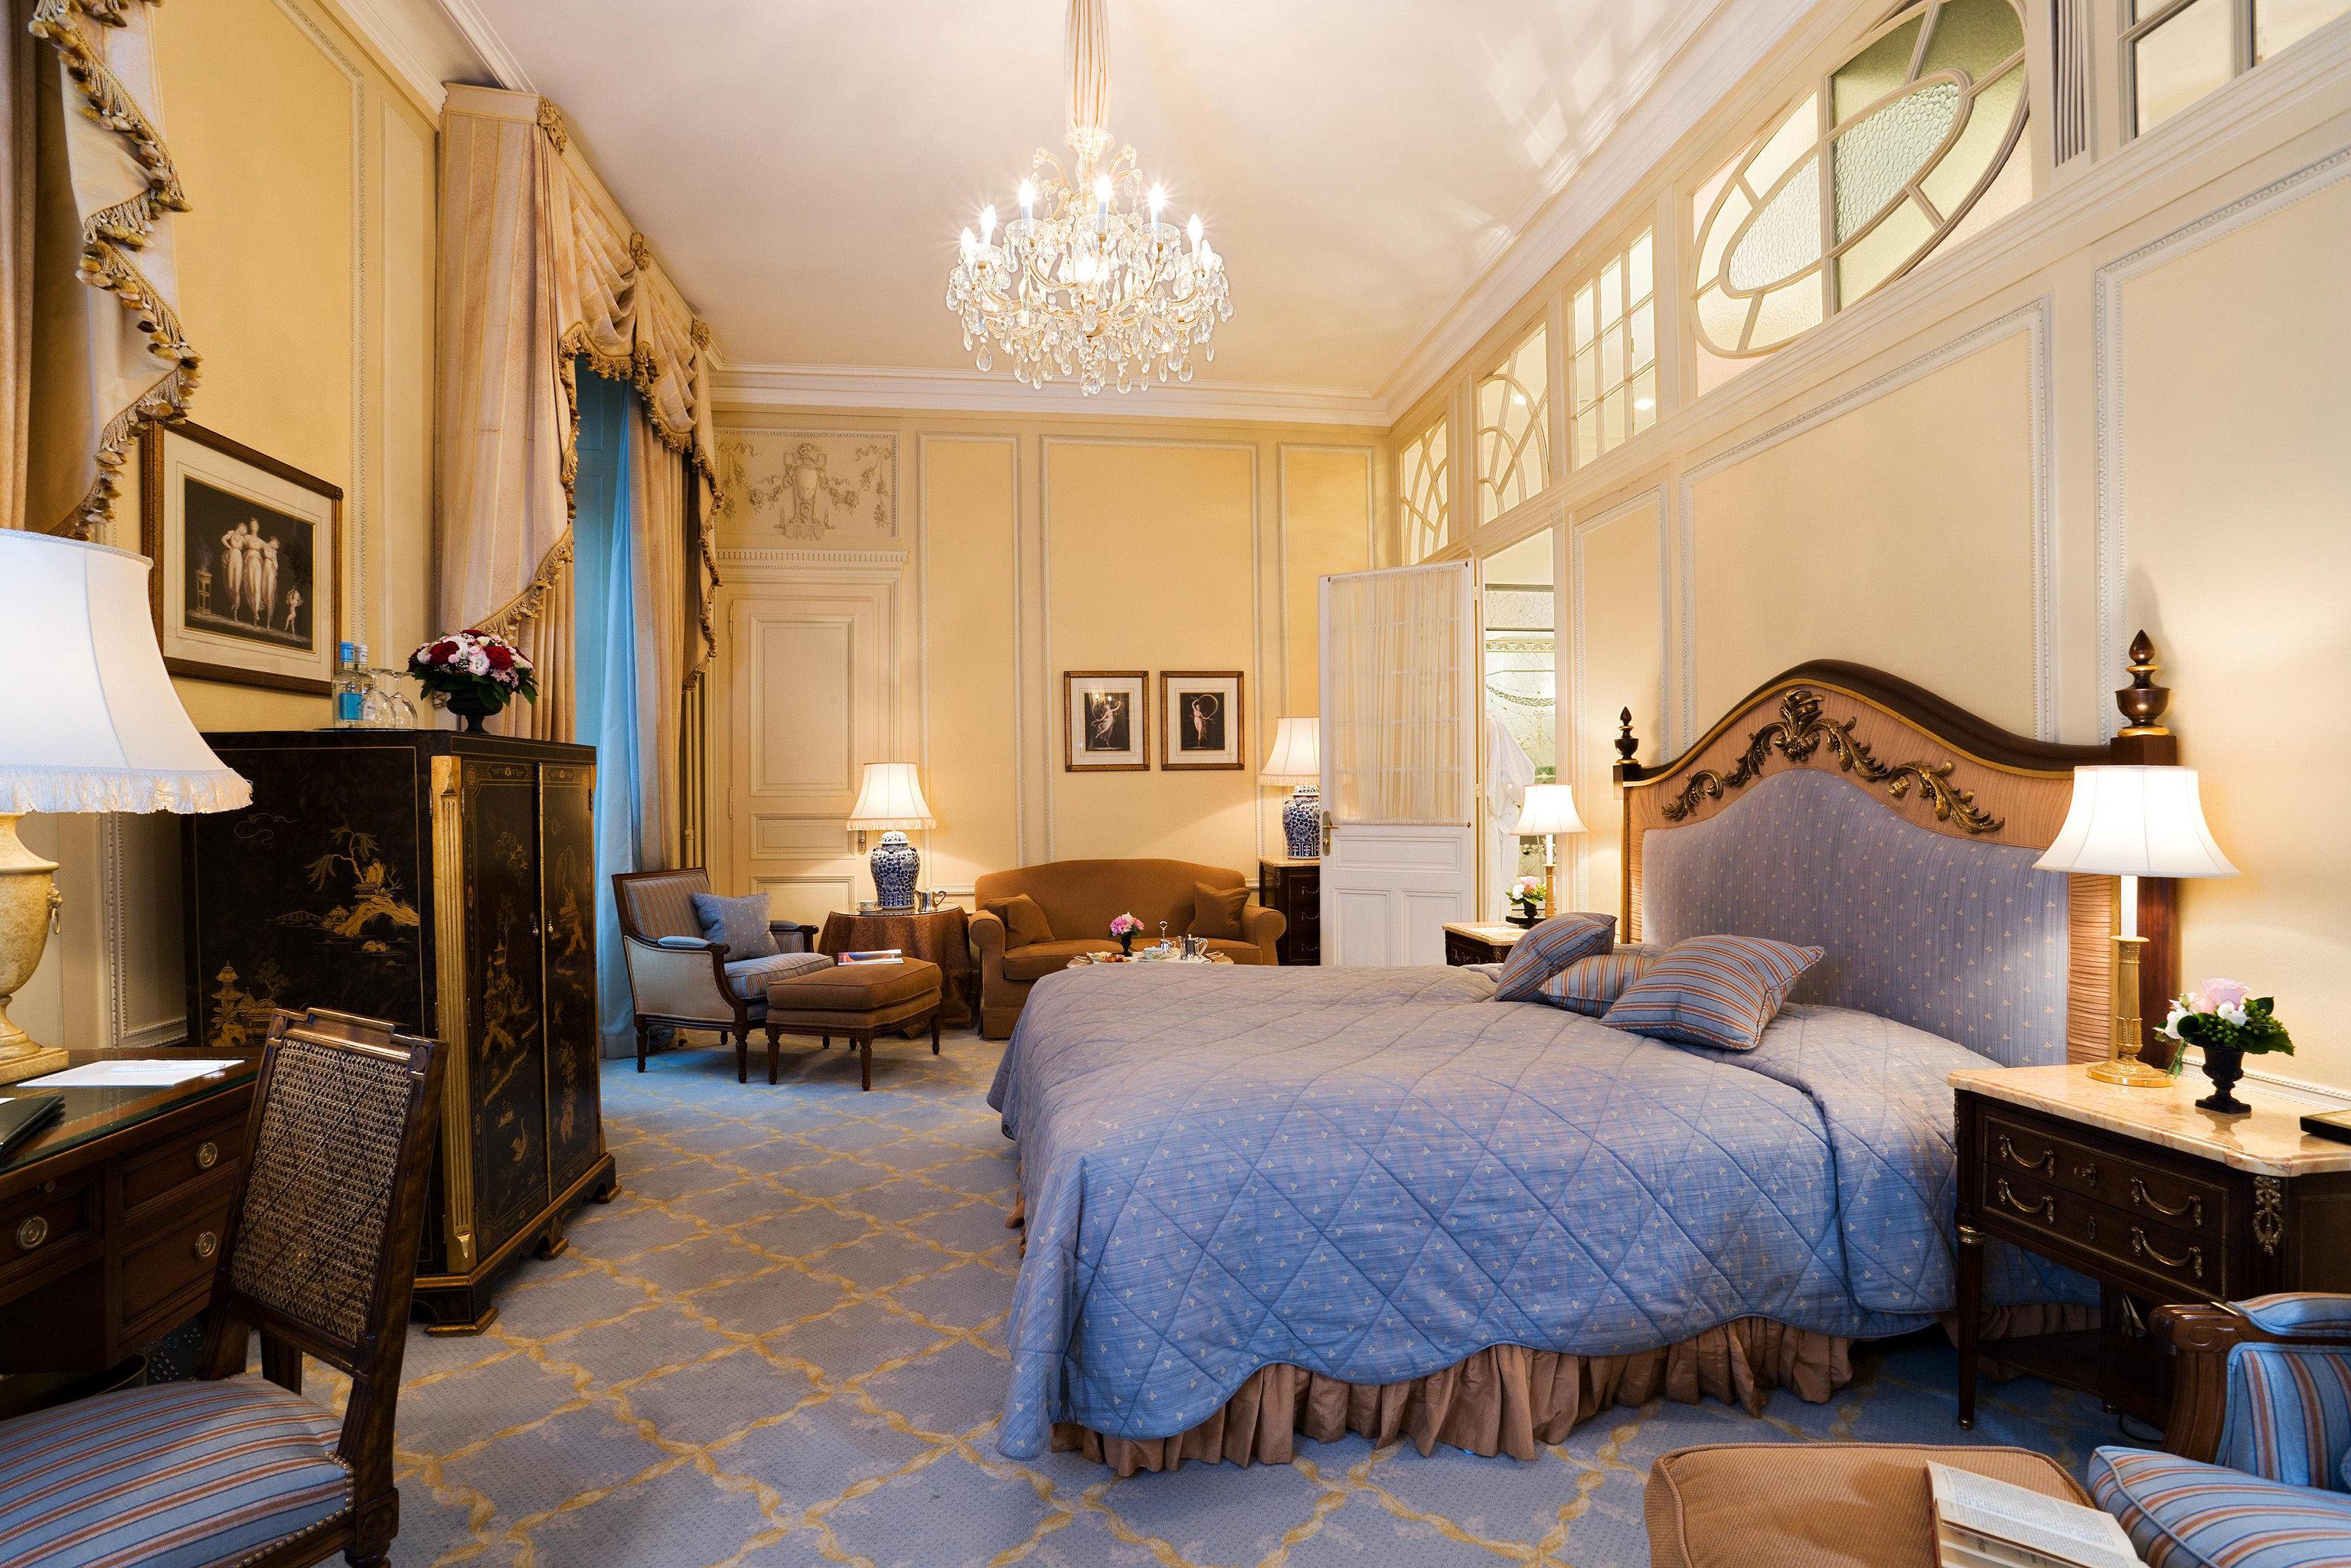 Bedroom Classic Elegant Historic Luxury Suite property home living room cottage farmhouse mansion Villa